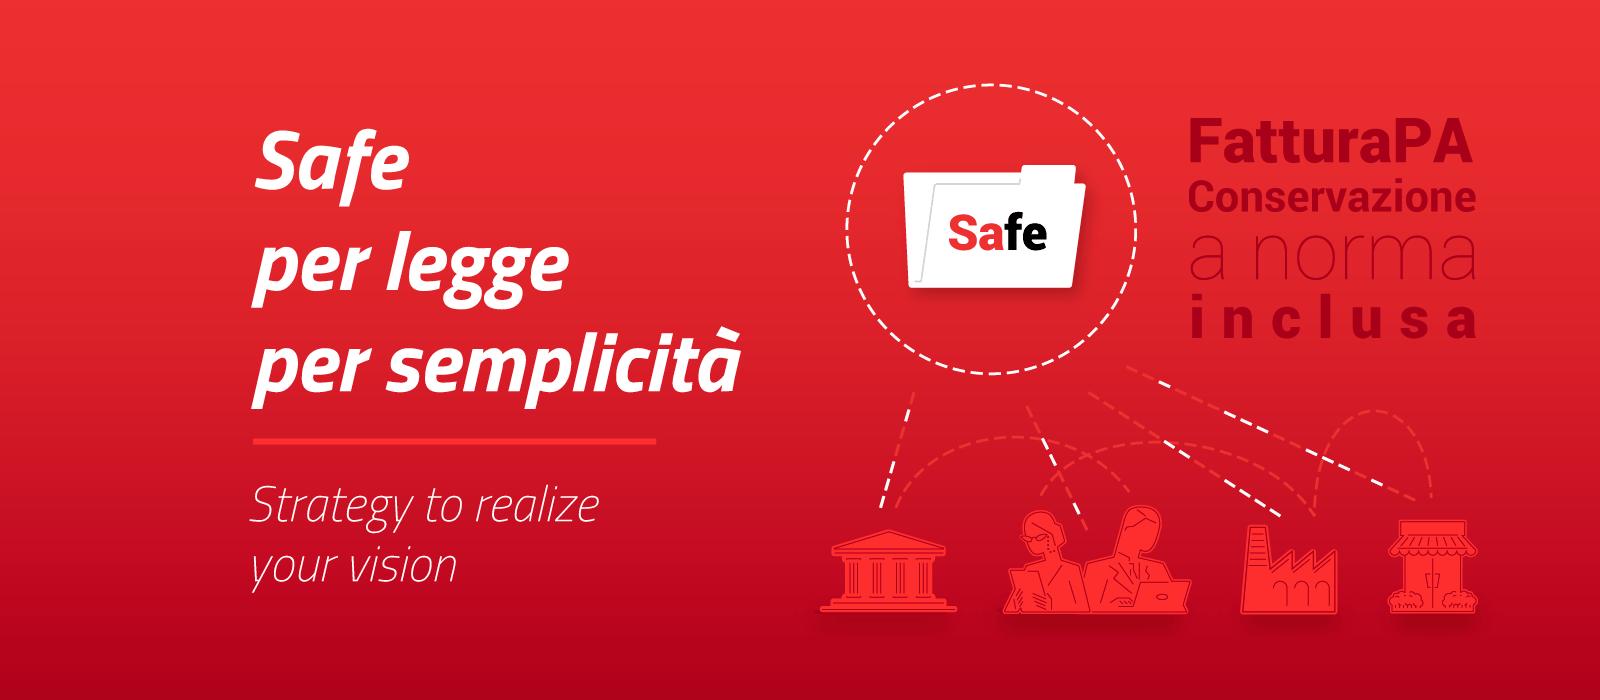 safe per legge per sempicità schema31